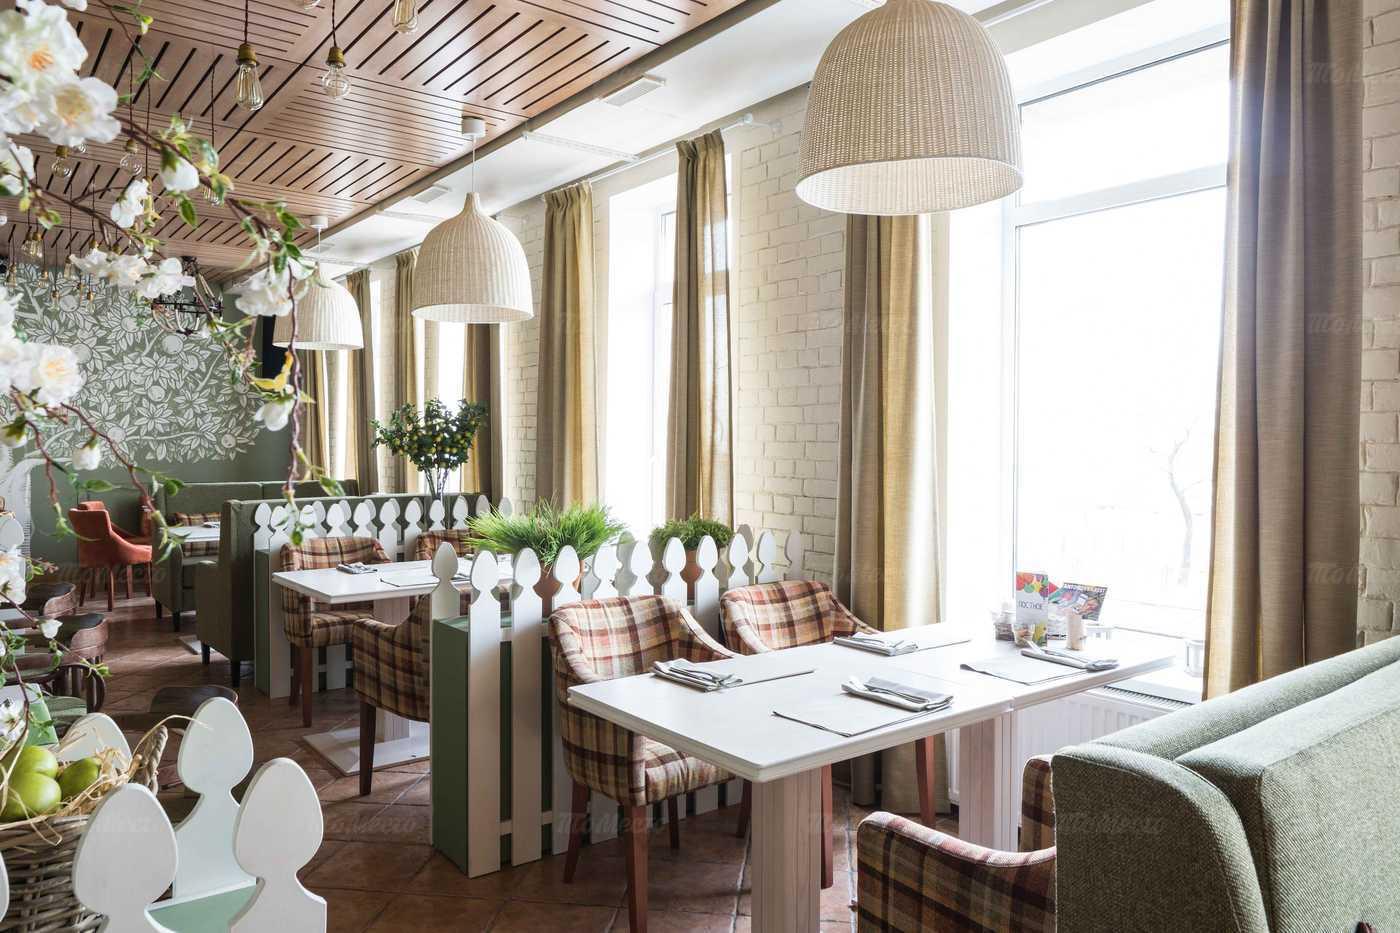 Меню ресторана Антоновка на проспекте Косыгина